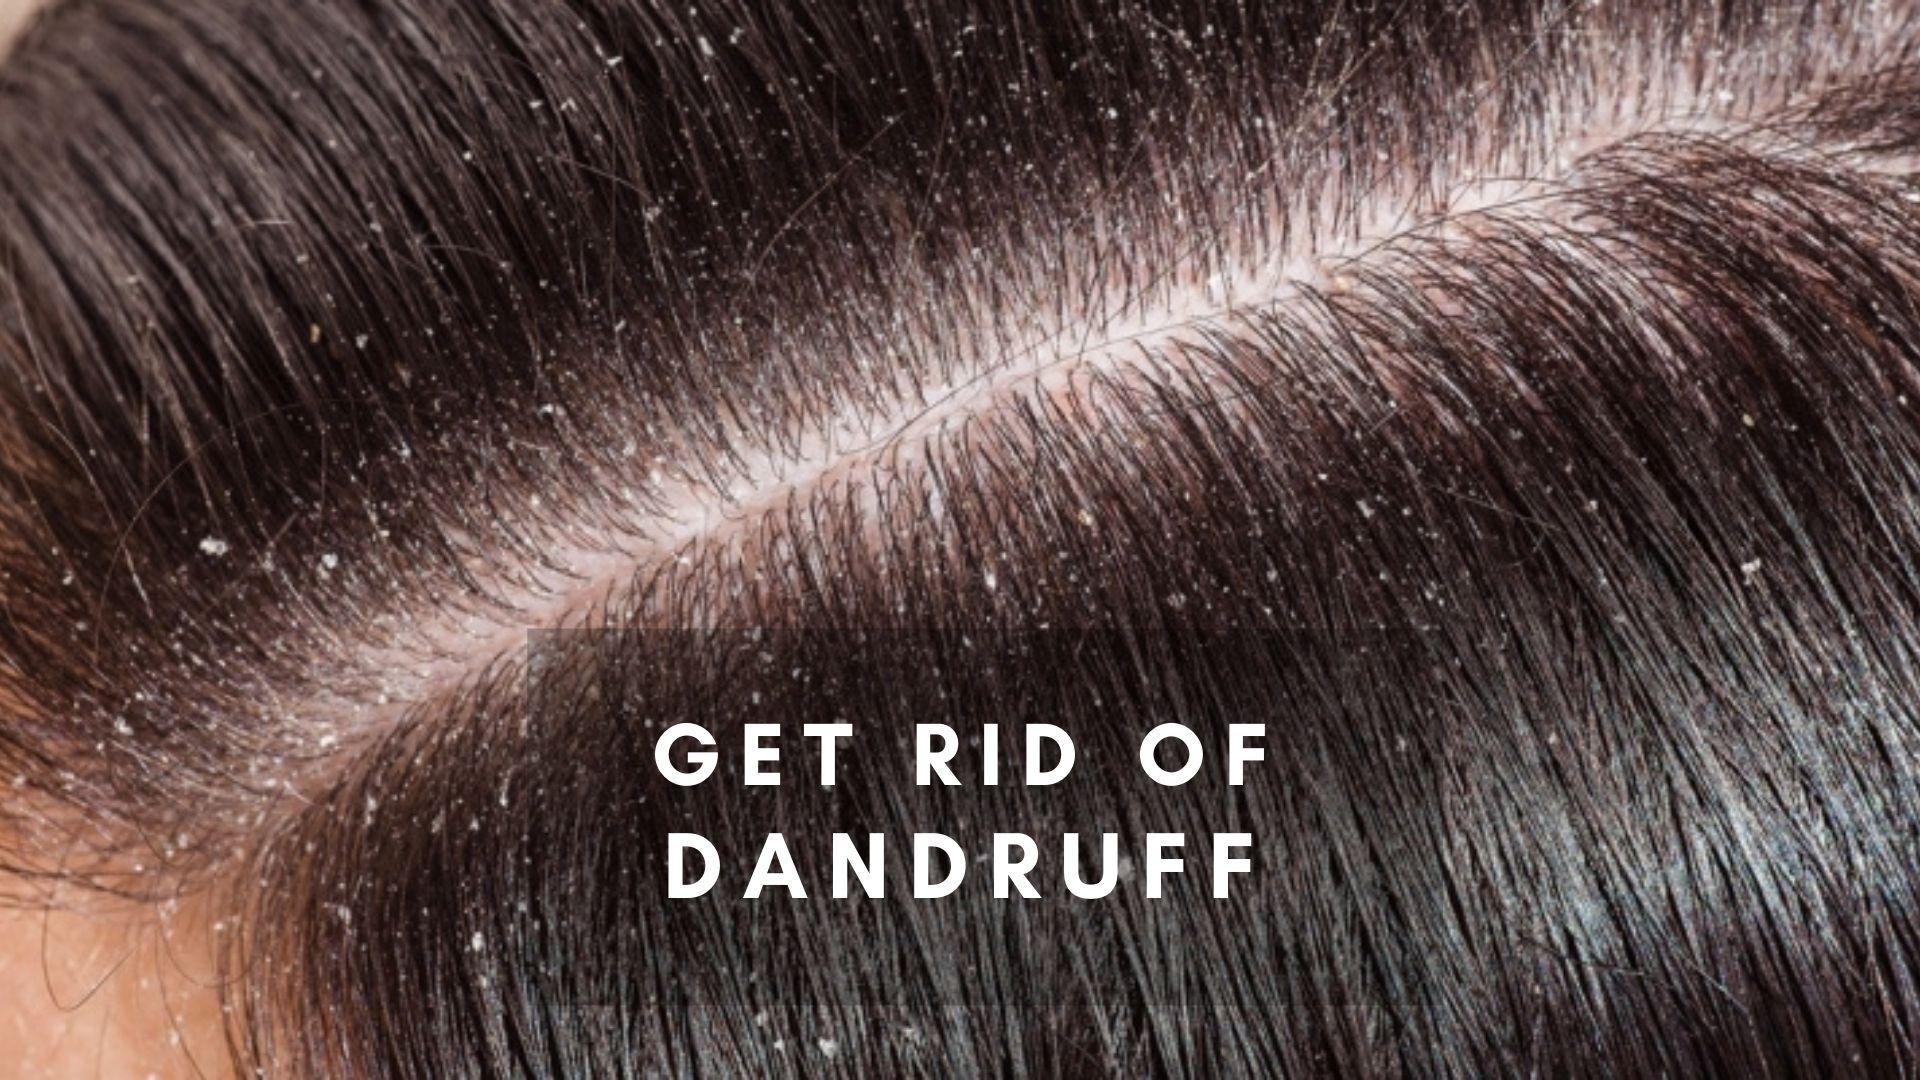 Home Remedies for Dandruff